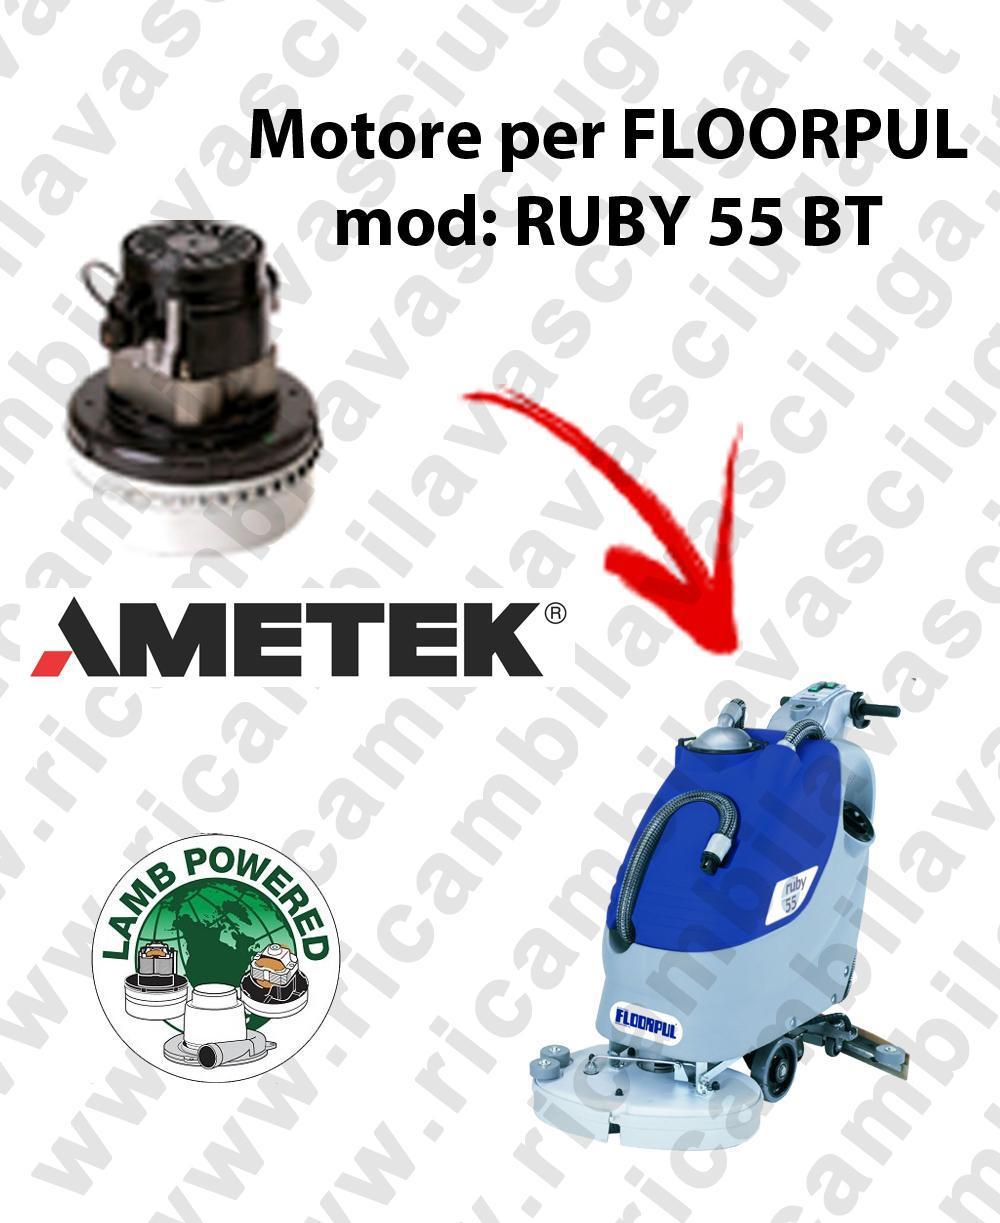 RUBY 55 BT Saugmotor LAMB AMETEK für scheuersaugmaschinen FLOORPUL